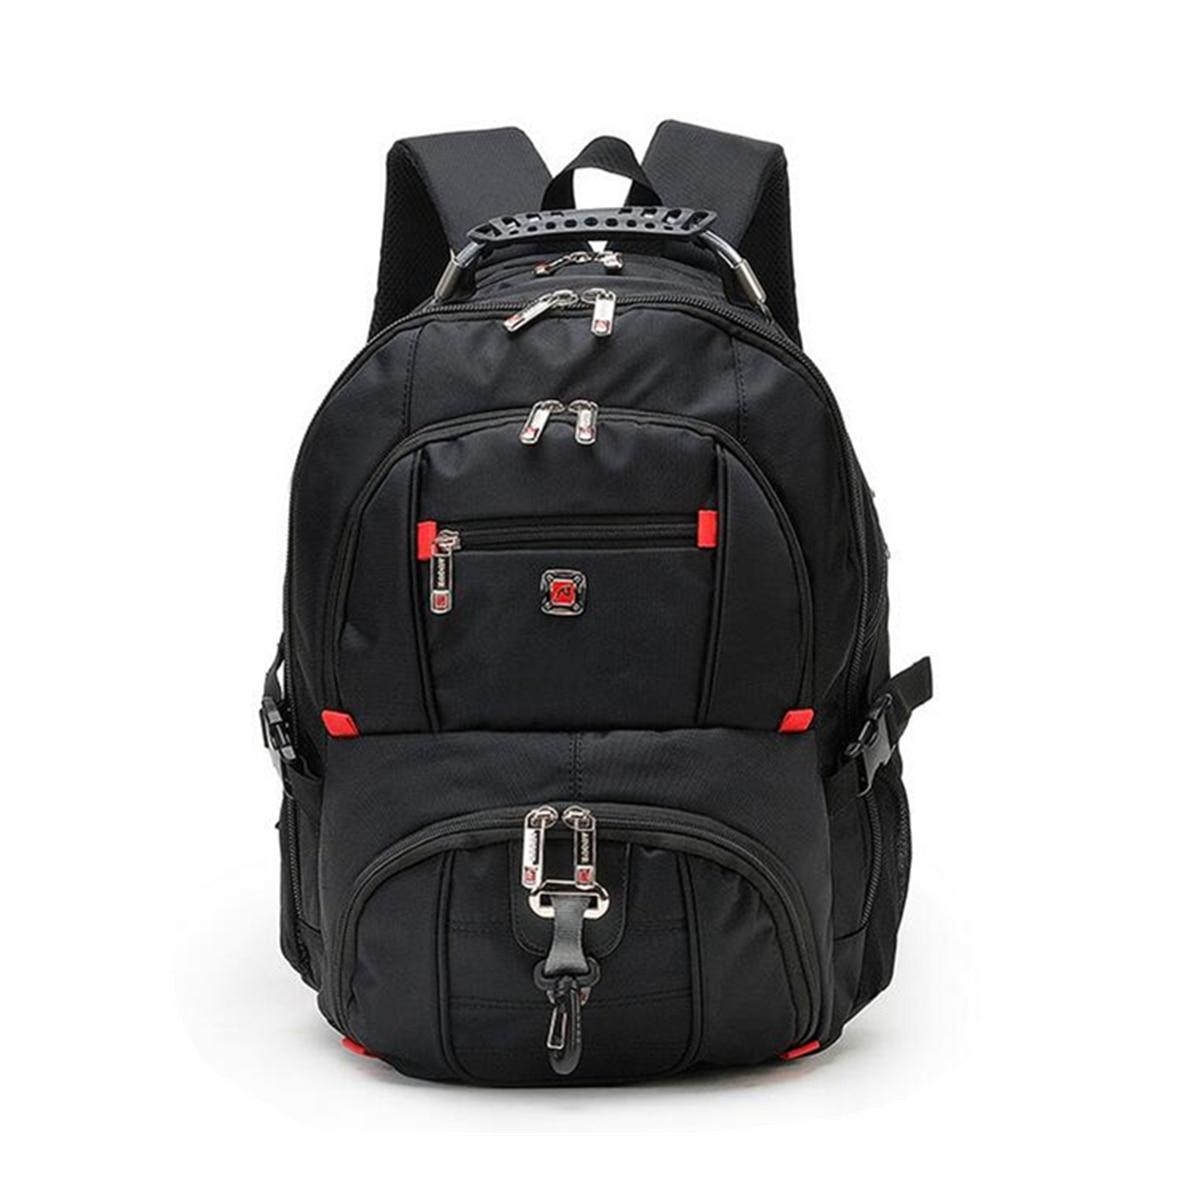 2019 Black Male Back Pack 15 Oxford Laptop Backpack Mens Travel Bags Waterproof Large Capacity Luggage Shoulder Bag Mochila2019 Black Male Back Pack 15 Oxford Laptop Backpack Mens Travel Bags Waterproof Large Capacity Luggage Shoulder Bag Mochila